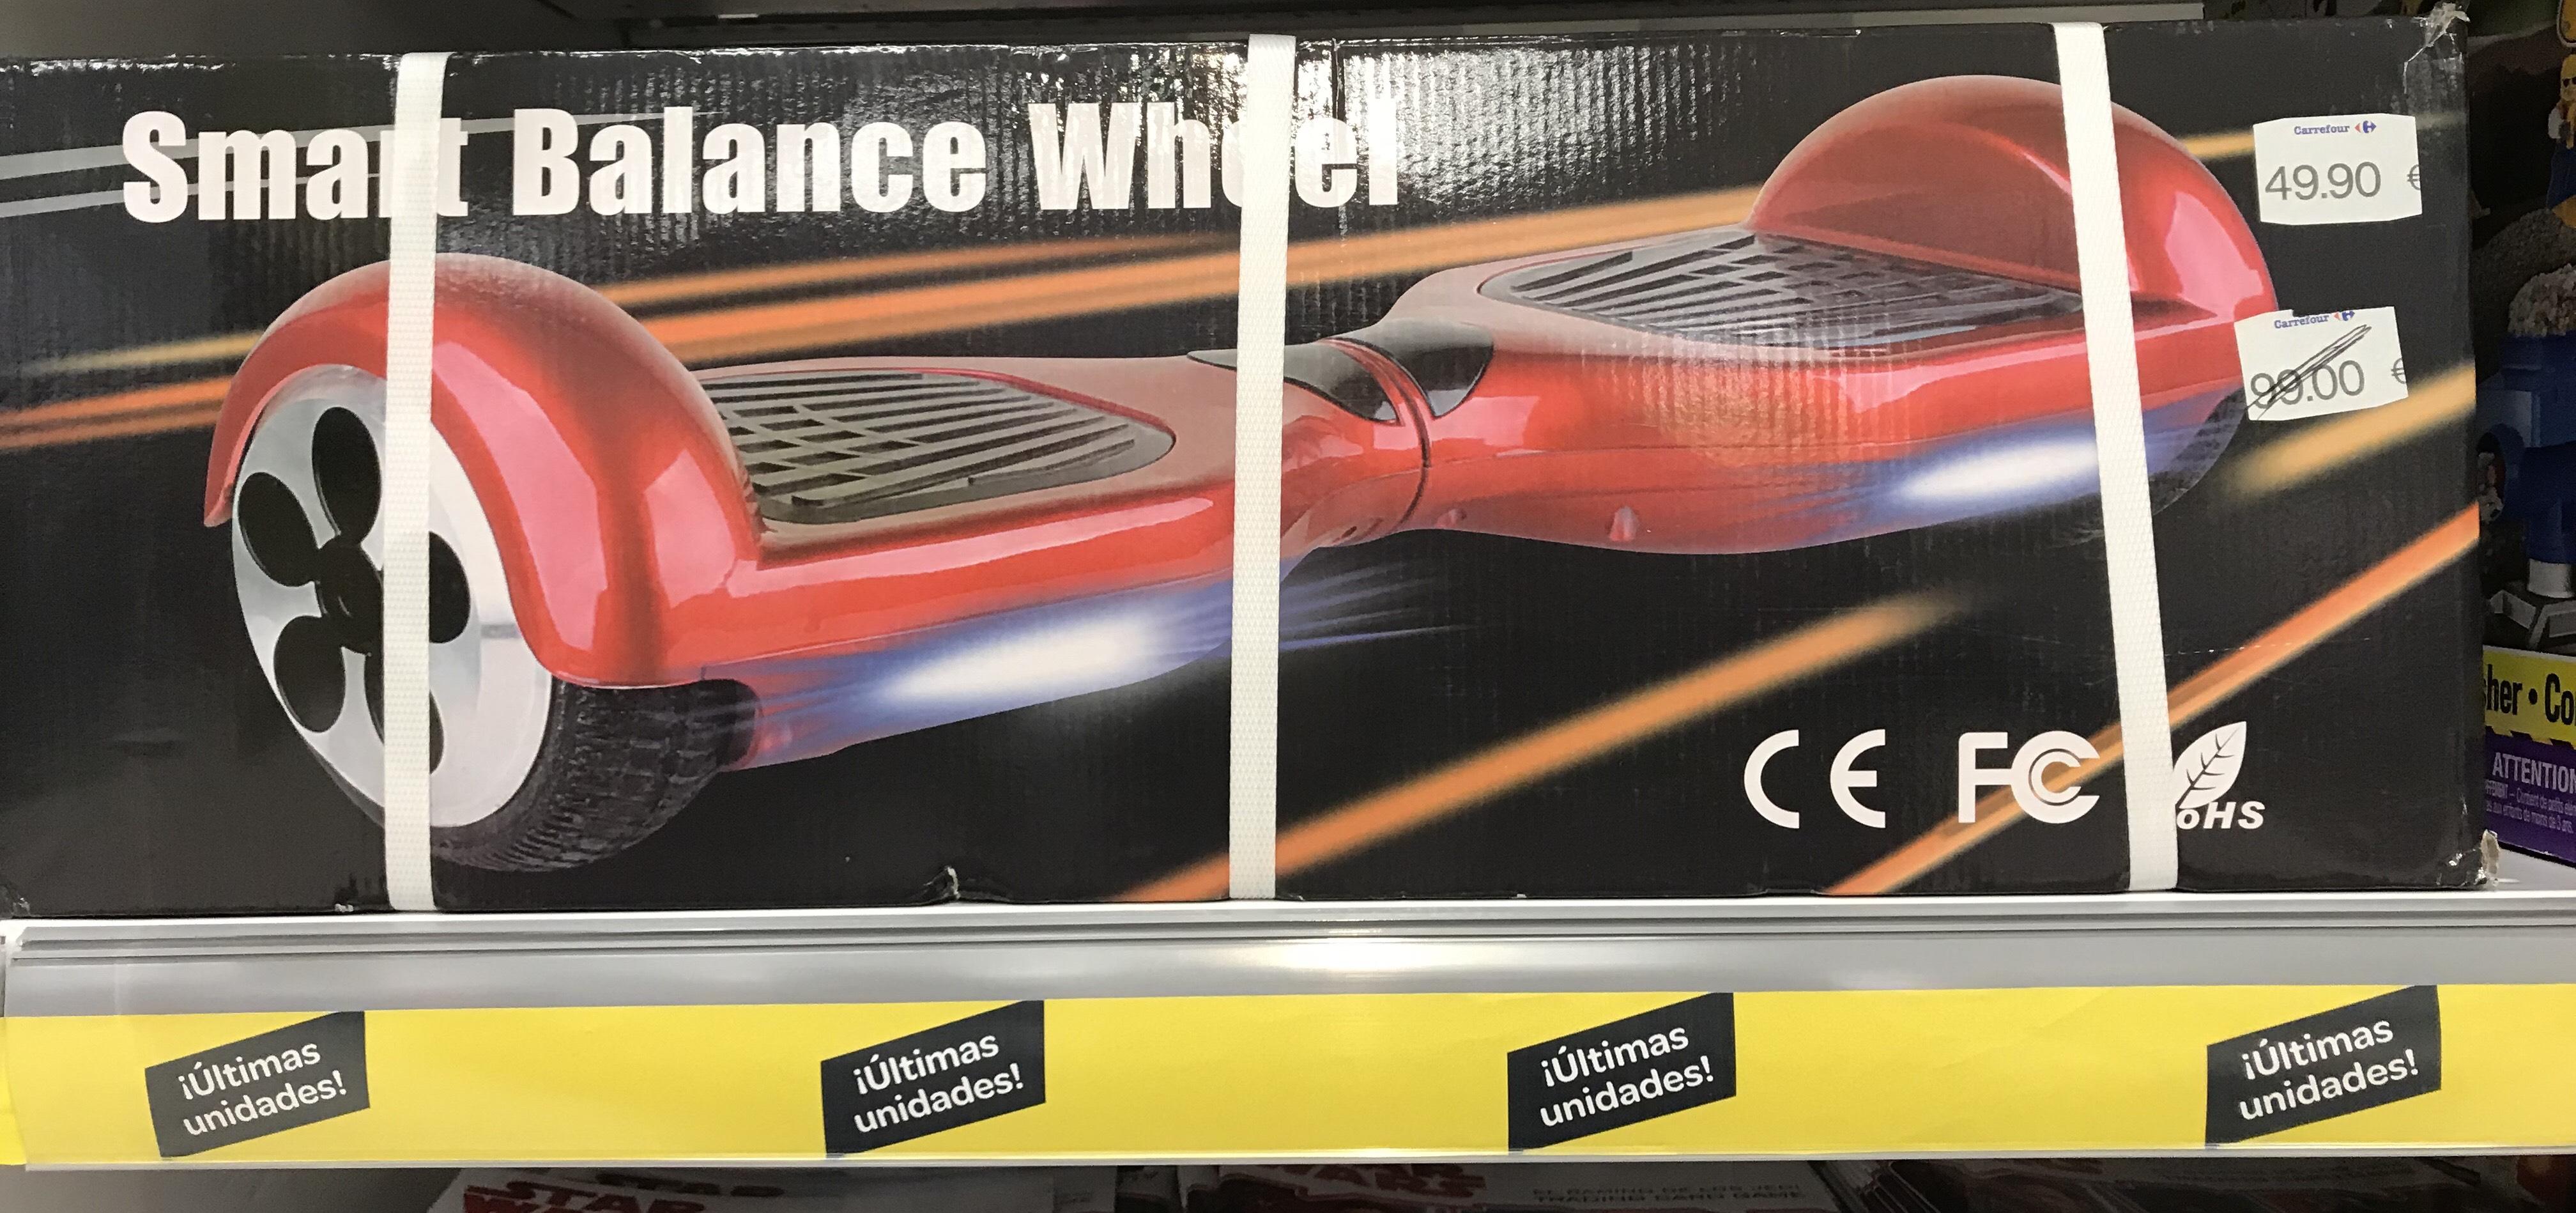 ¡Patinete Hoverboard sólo 49,90€! Carrefour